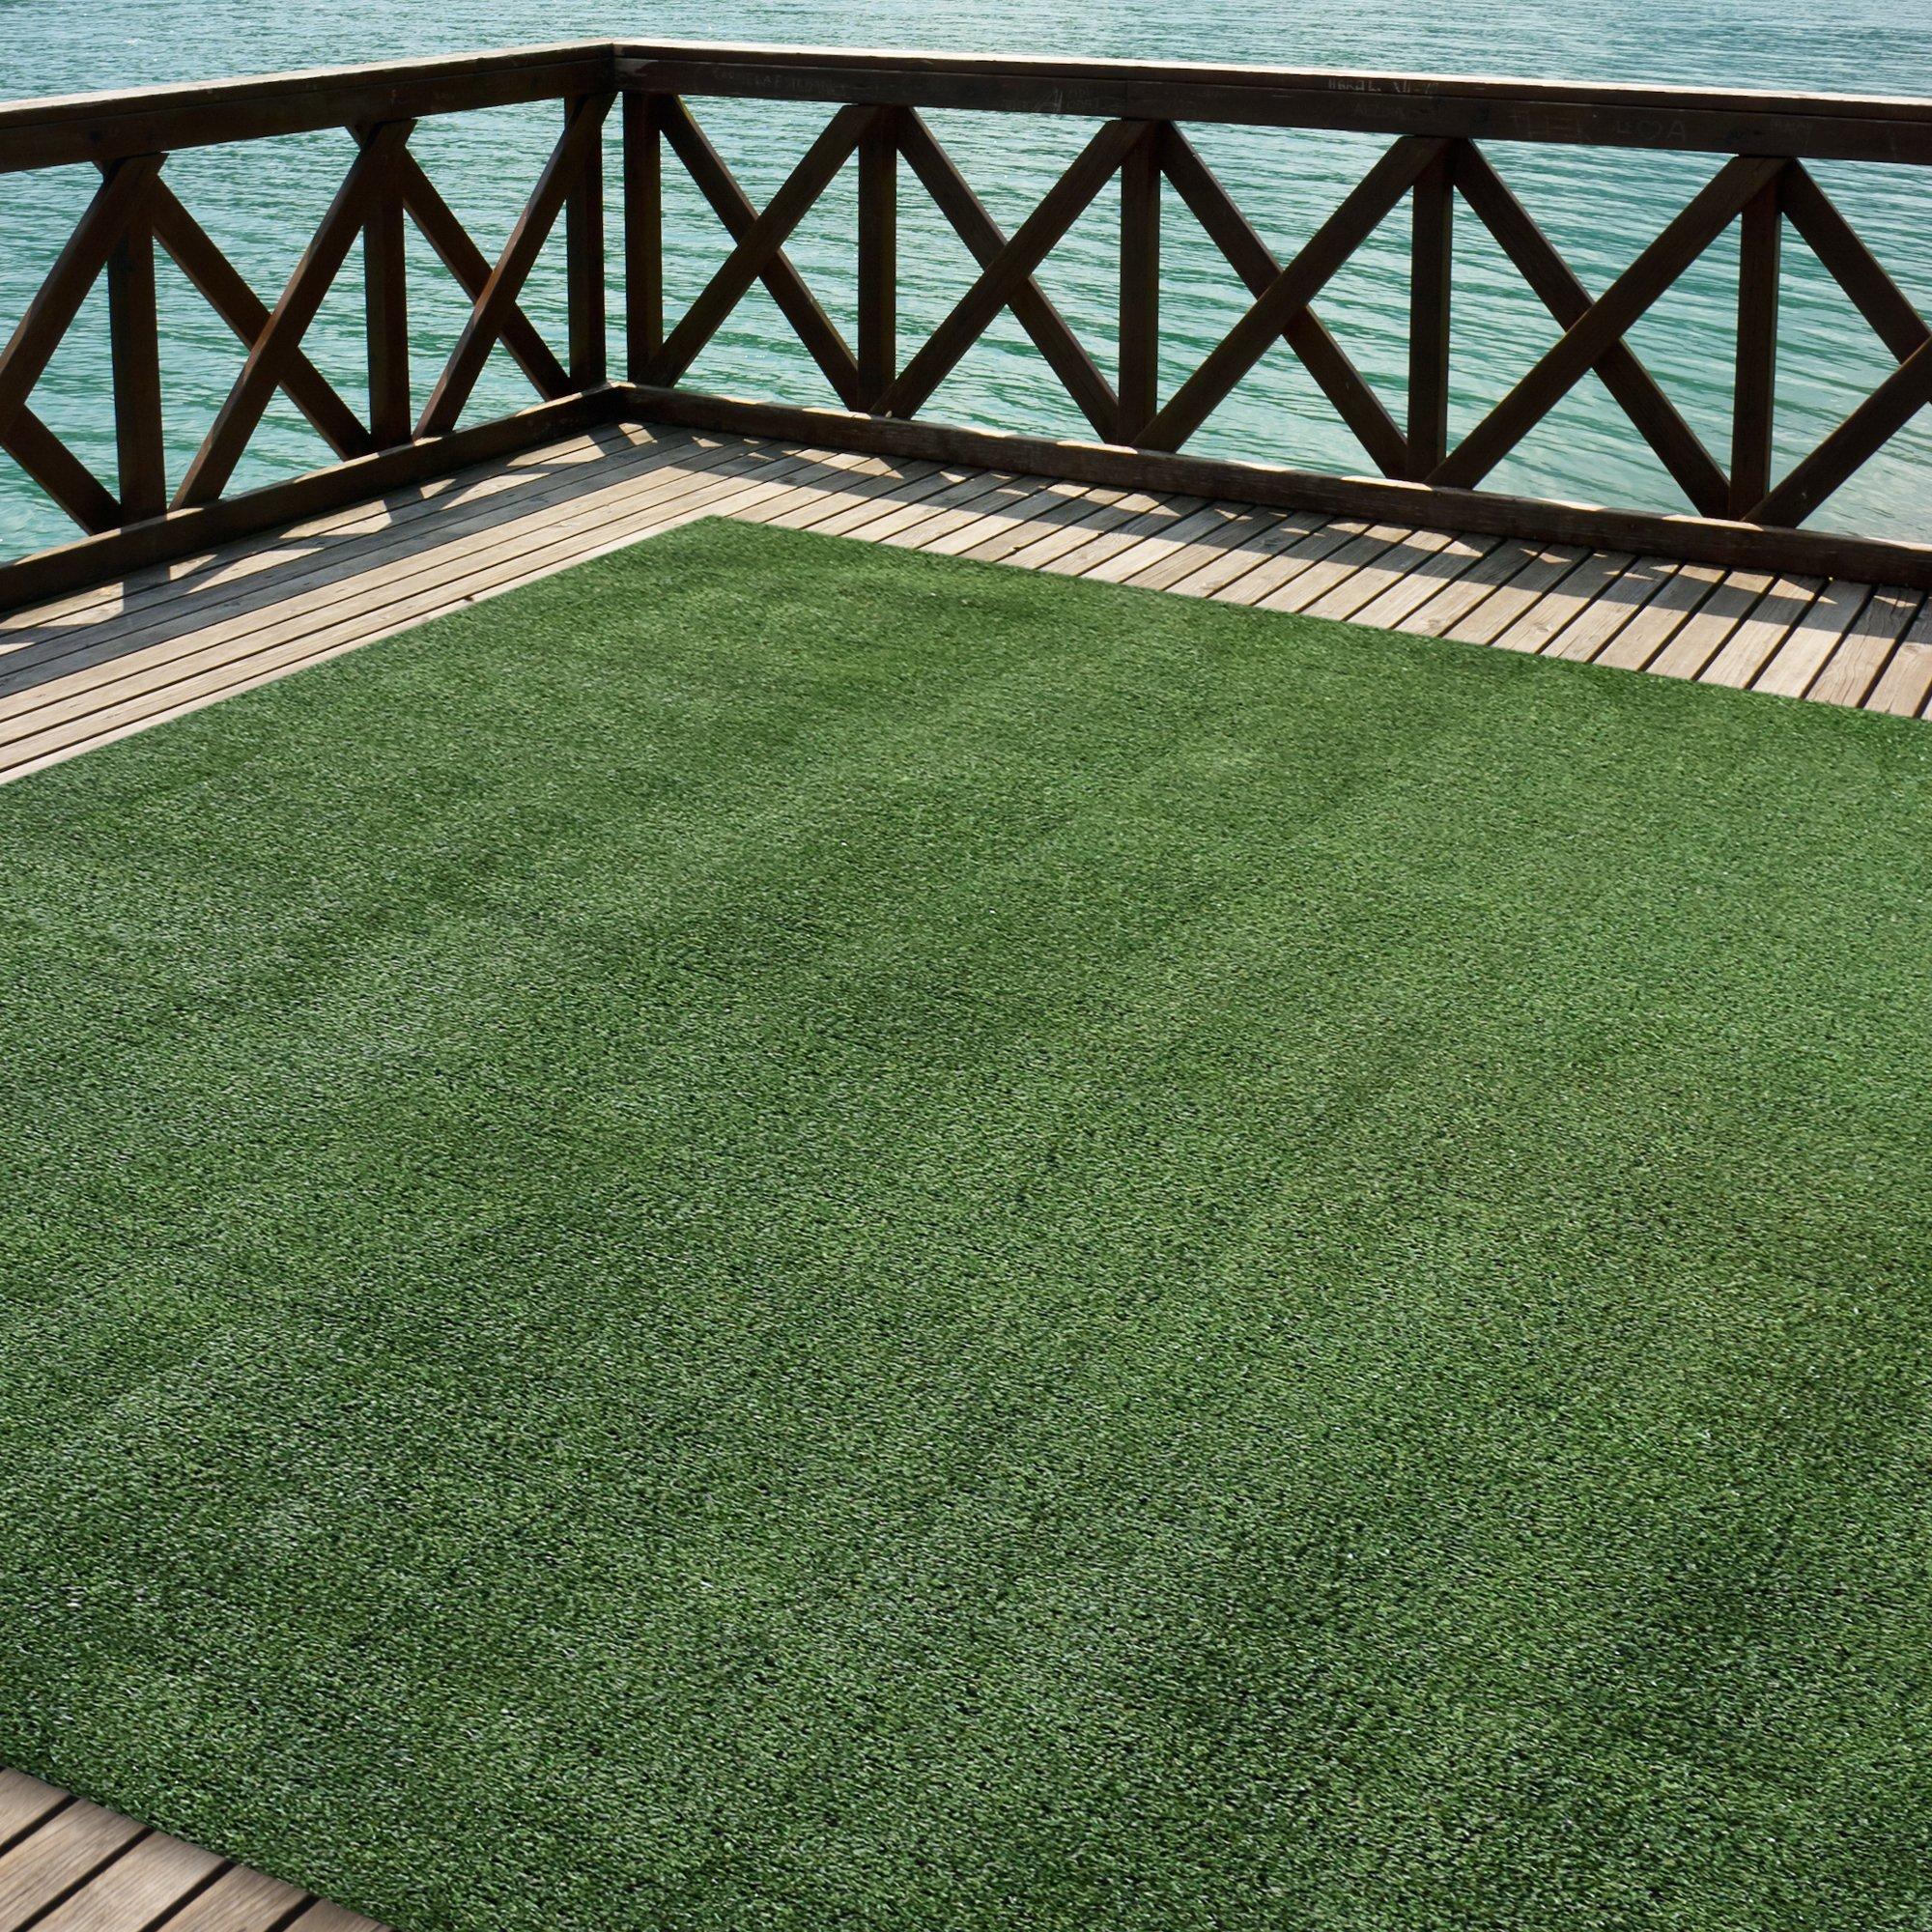 Outdoor Turf Rug Green Artificial Grass Indoor Deck Patio Carpet Mat 12u0027 X  24u0027